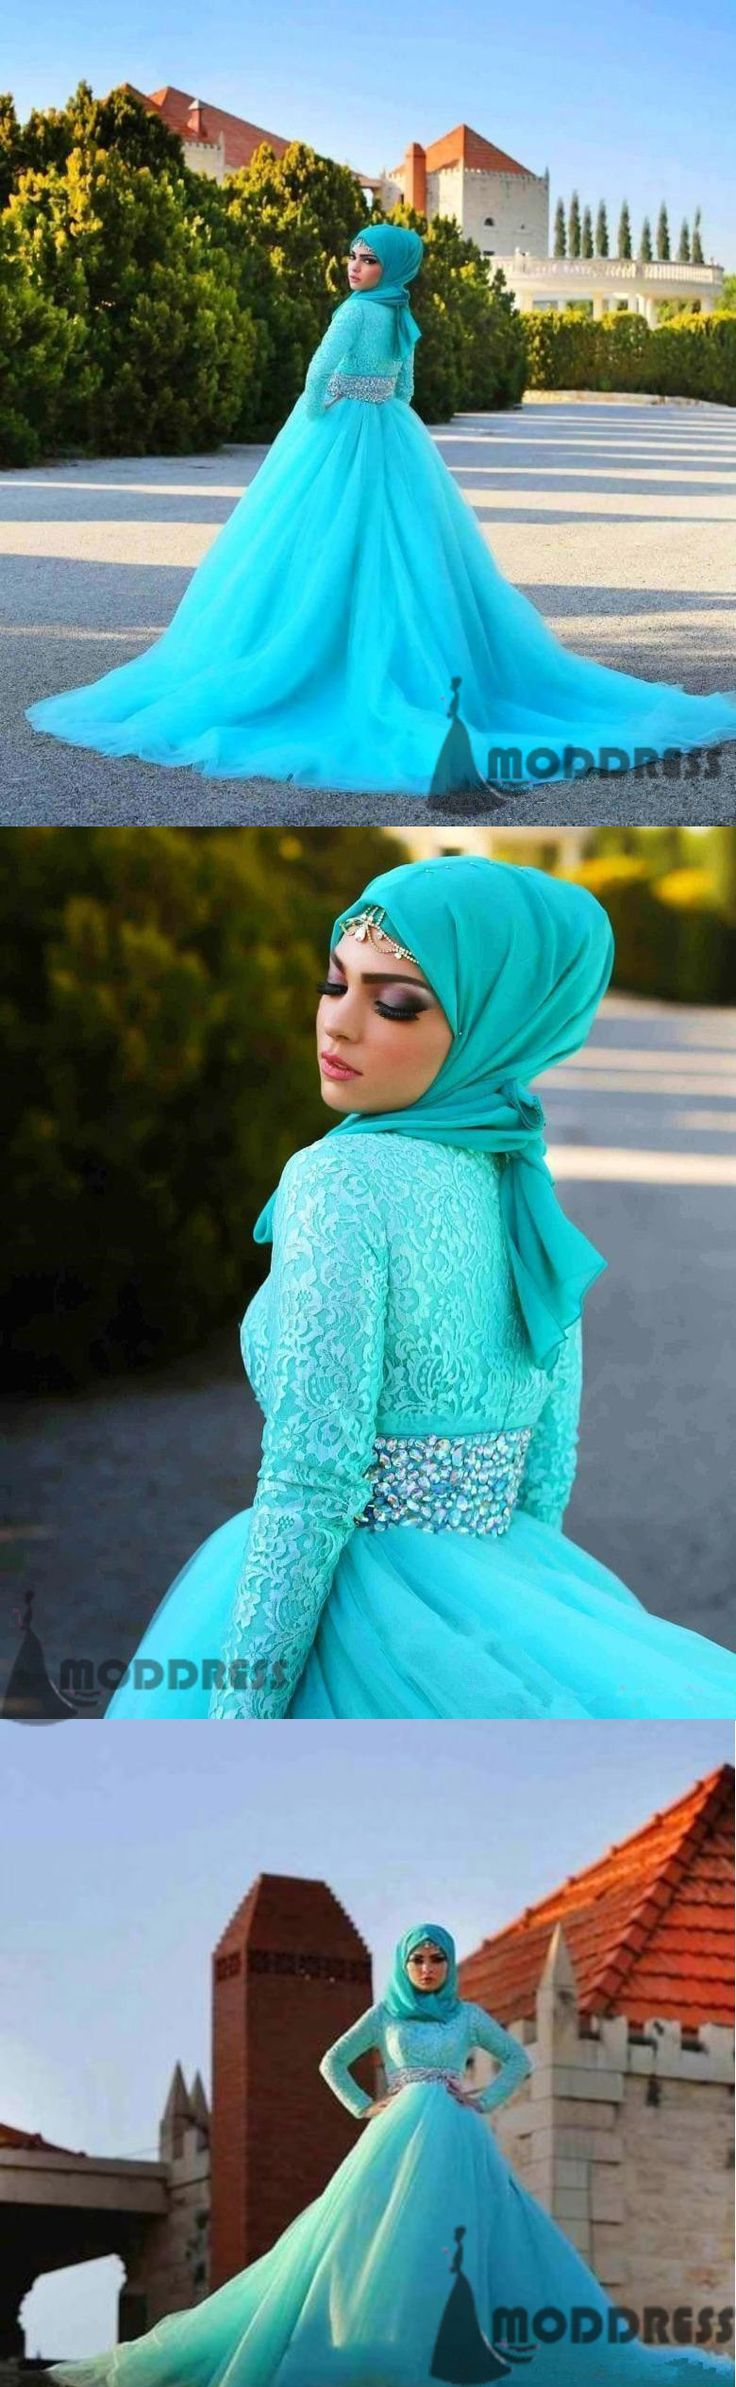 Muslim Wedding Dresses Crystal Tulle Bridal Dresses,HS682 #weddingdress#fashion#promdress#eveningdress#promgowns#cocktaildress